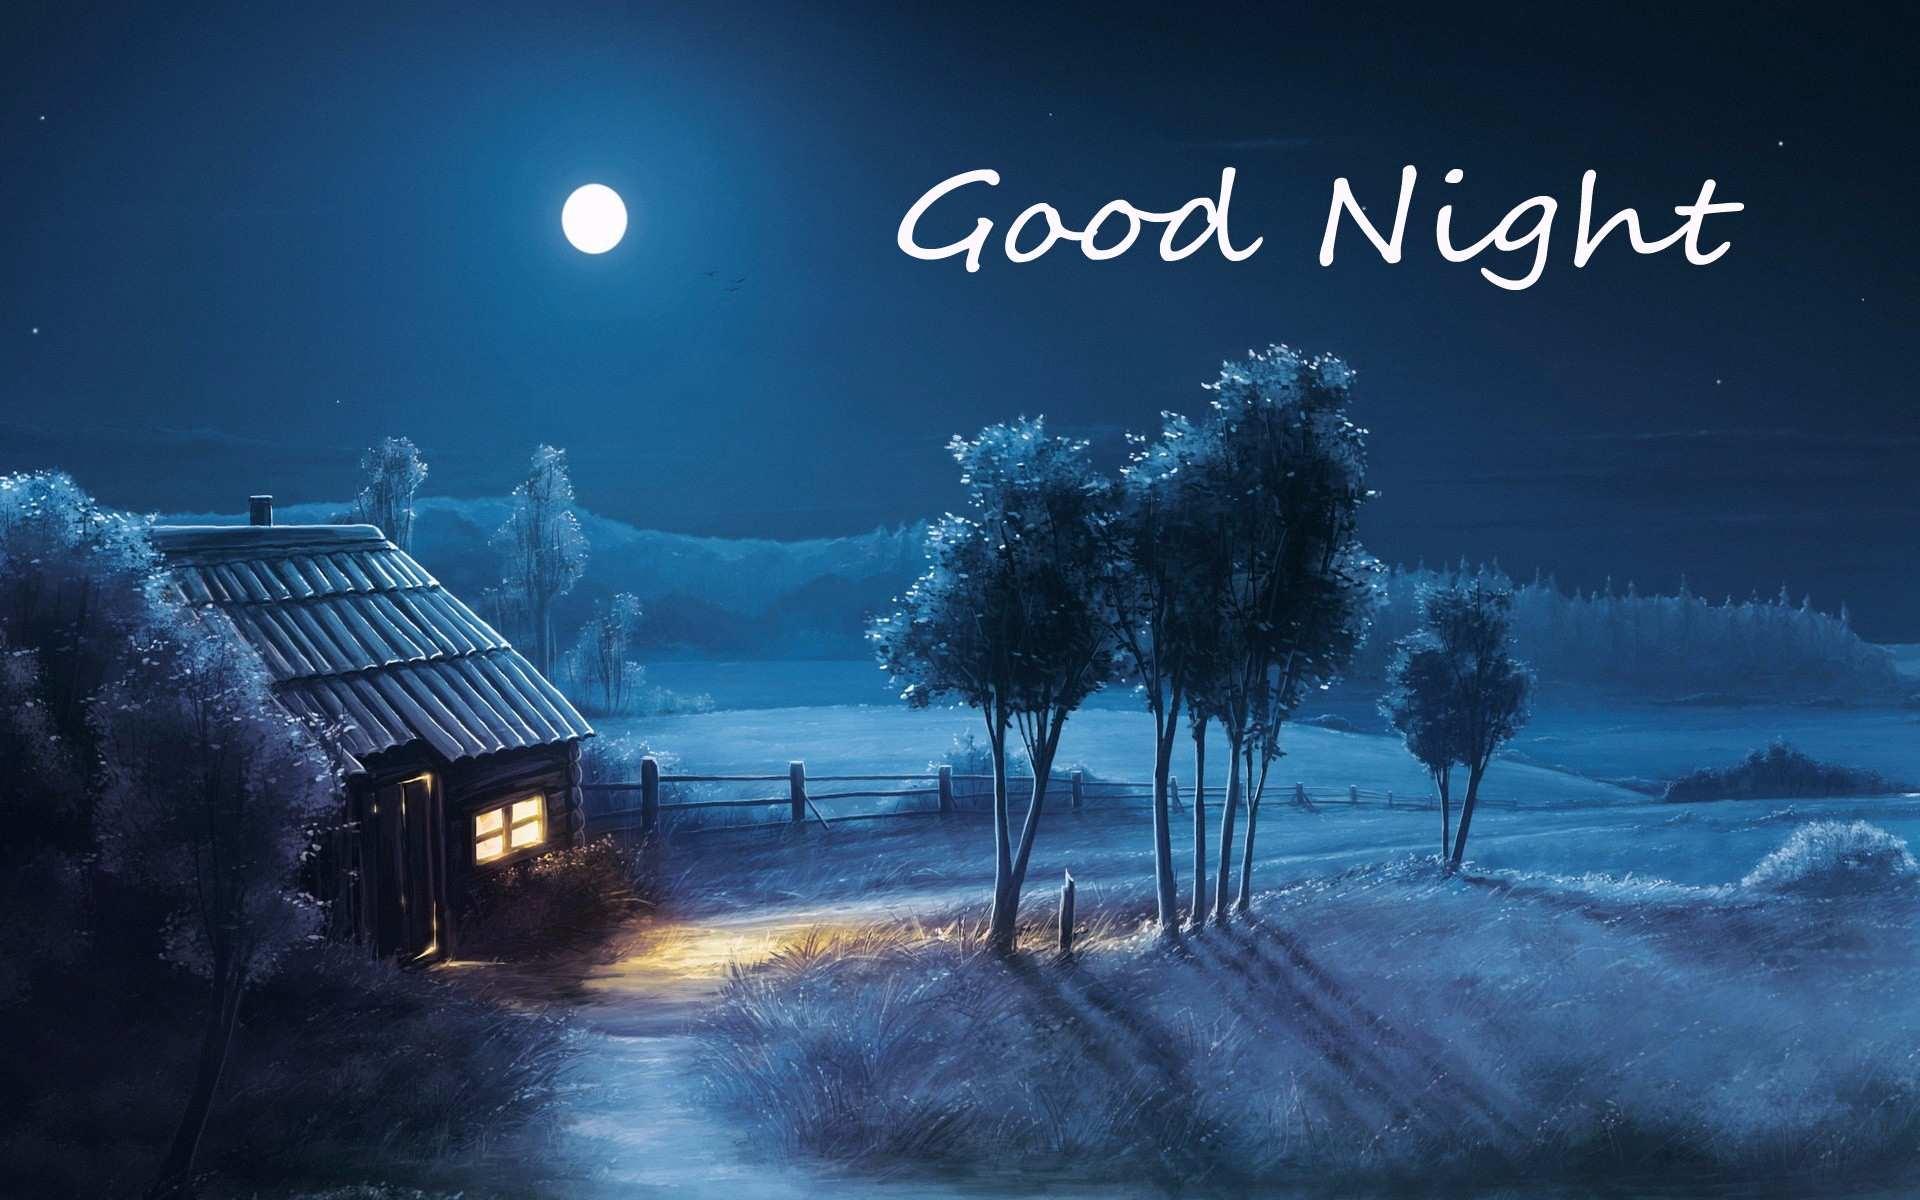 Good Night Wallpapers 1